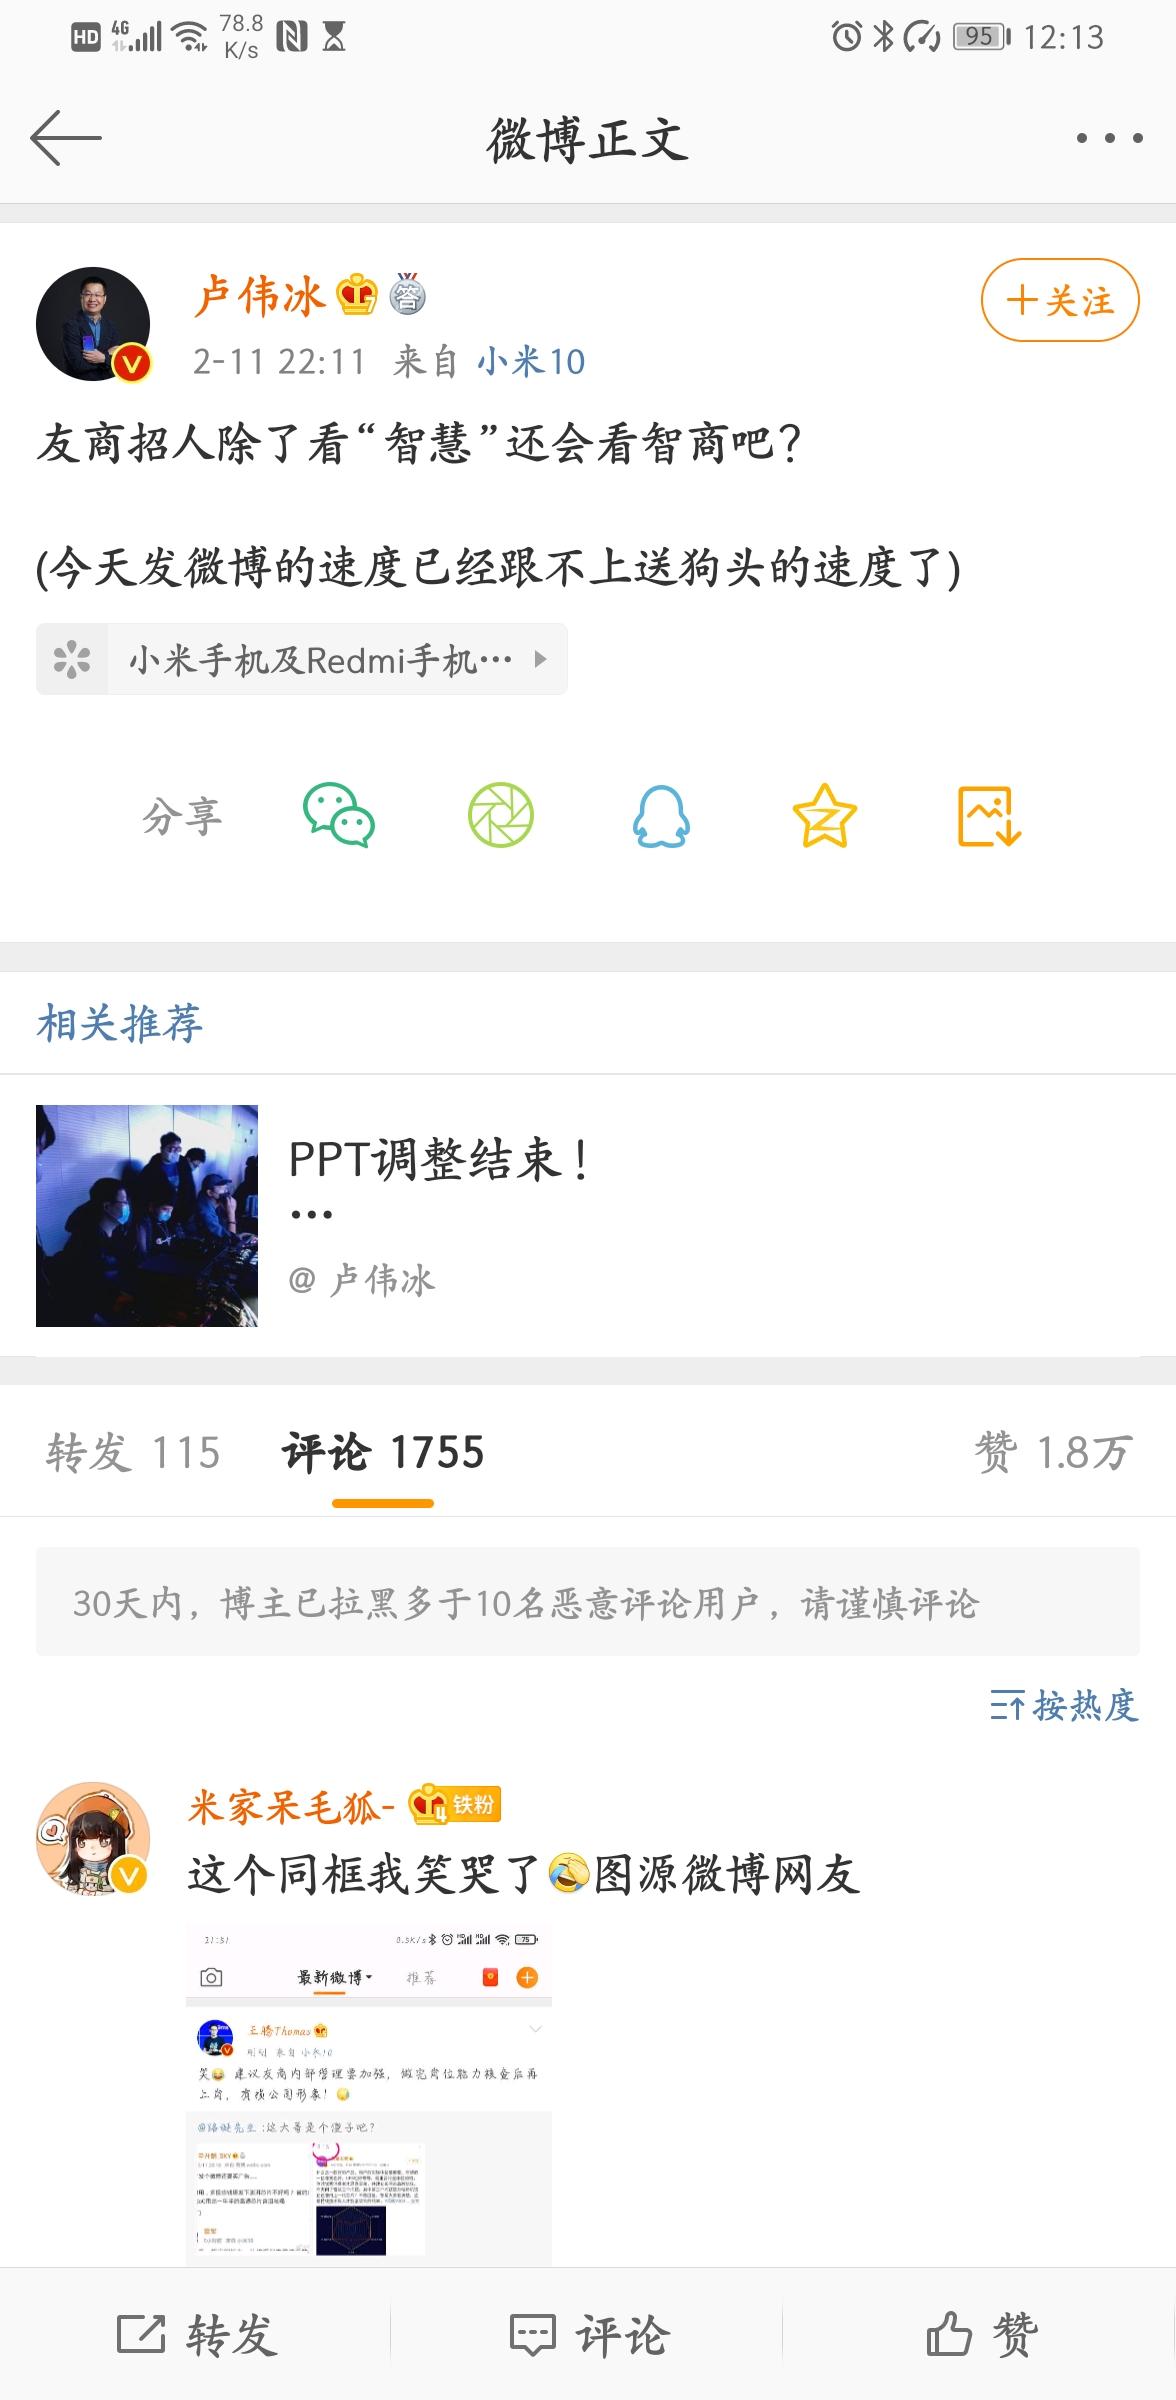 Screenshot_20200213_121353_com.sina.weibo.jpg